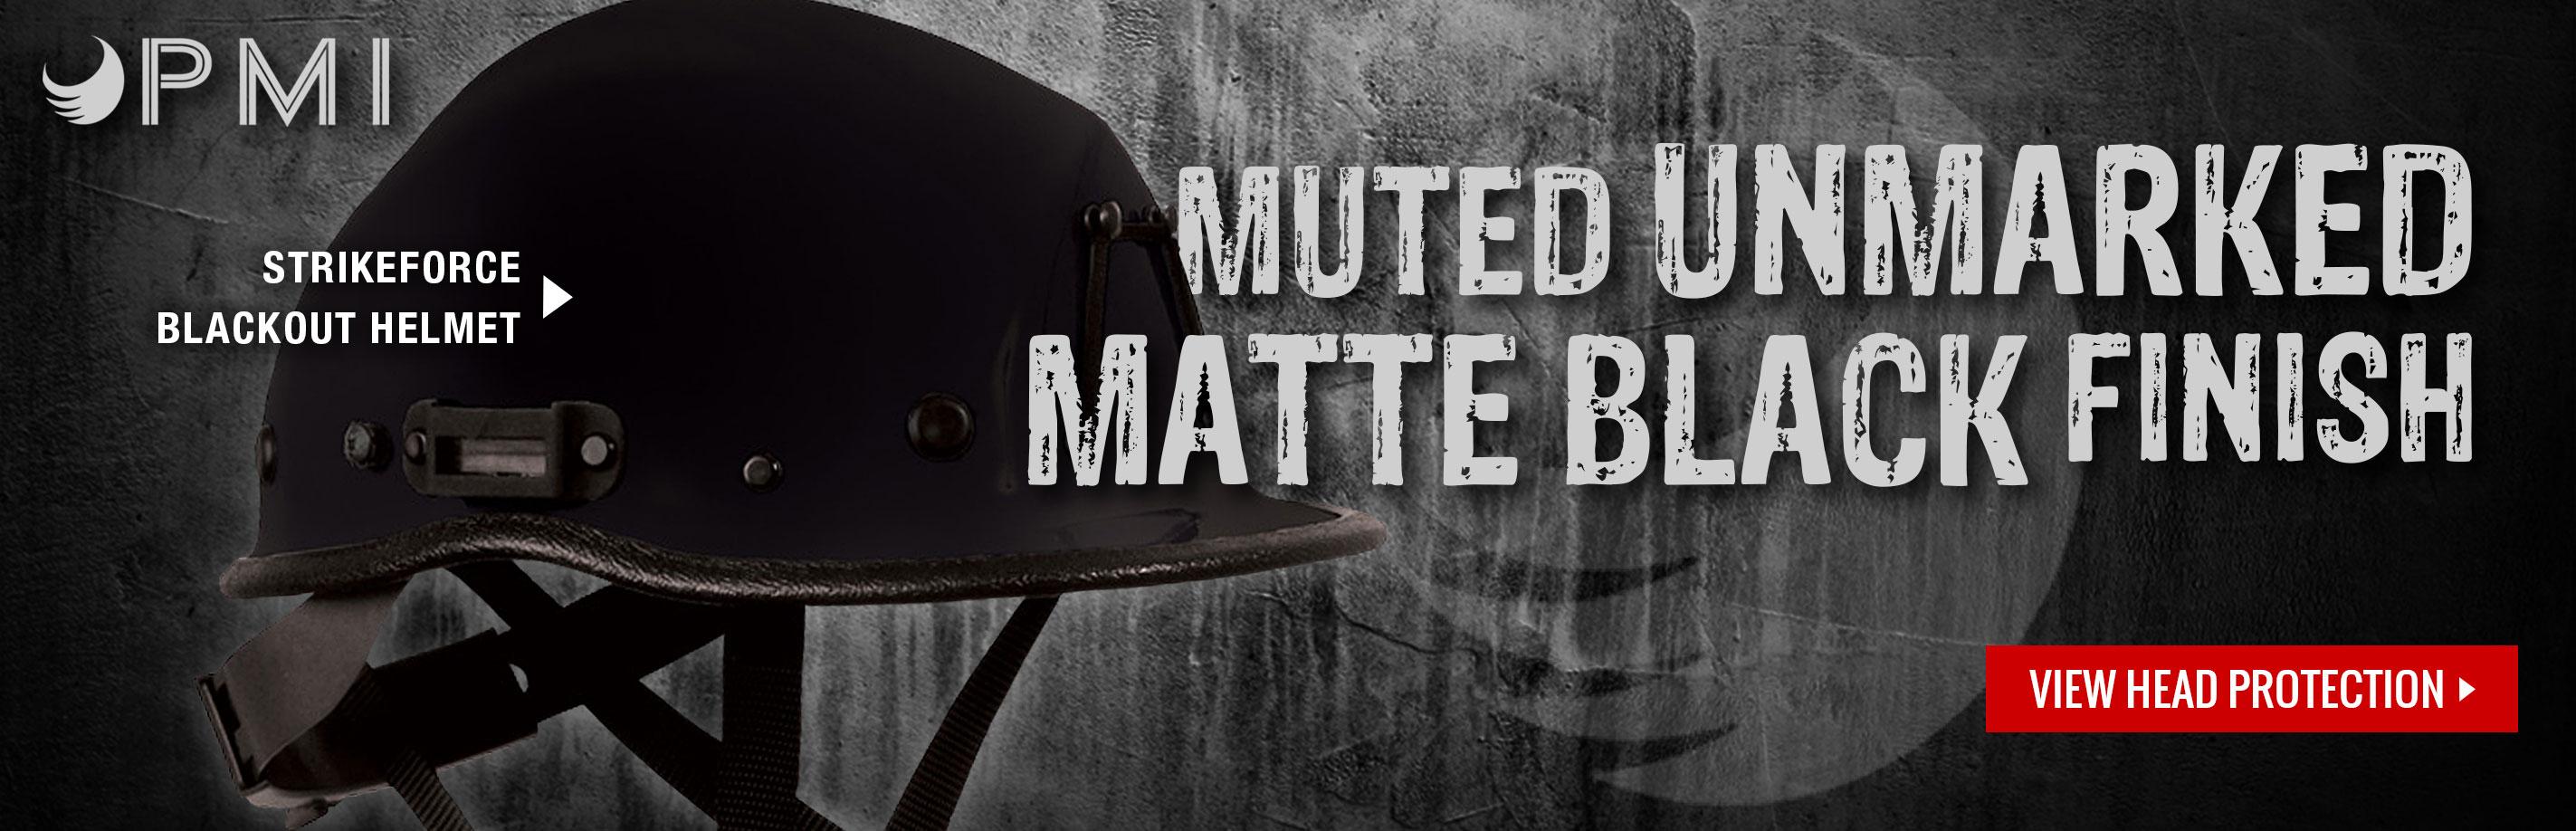 Strikeforce Blackout Helmet